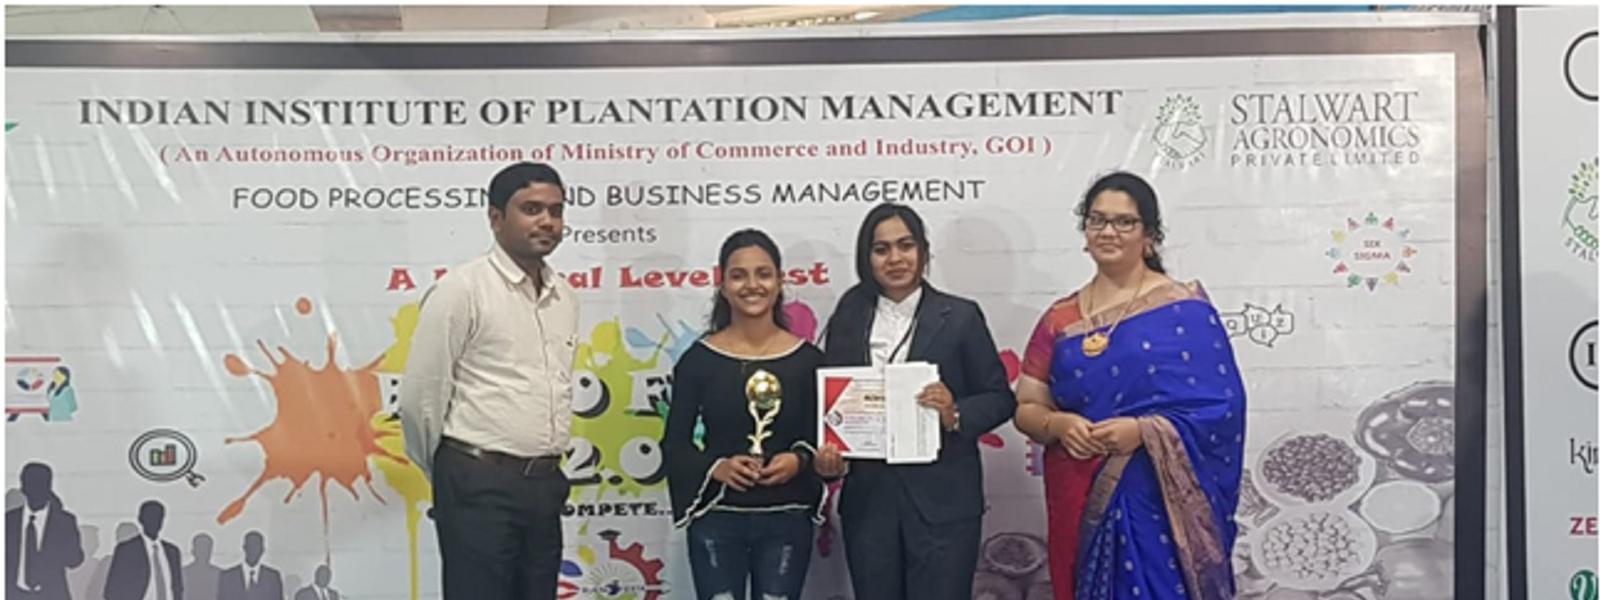 Sakshi Andholkar & Anupriya Mahajan Awared 1st prize in BUENO FESTA-20 ( Poster) held at IIPM, Banglore on 19th -20th December 2019